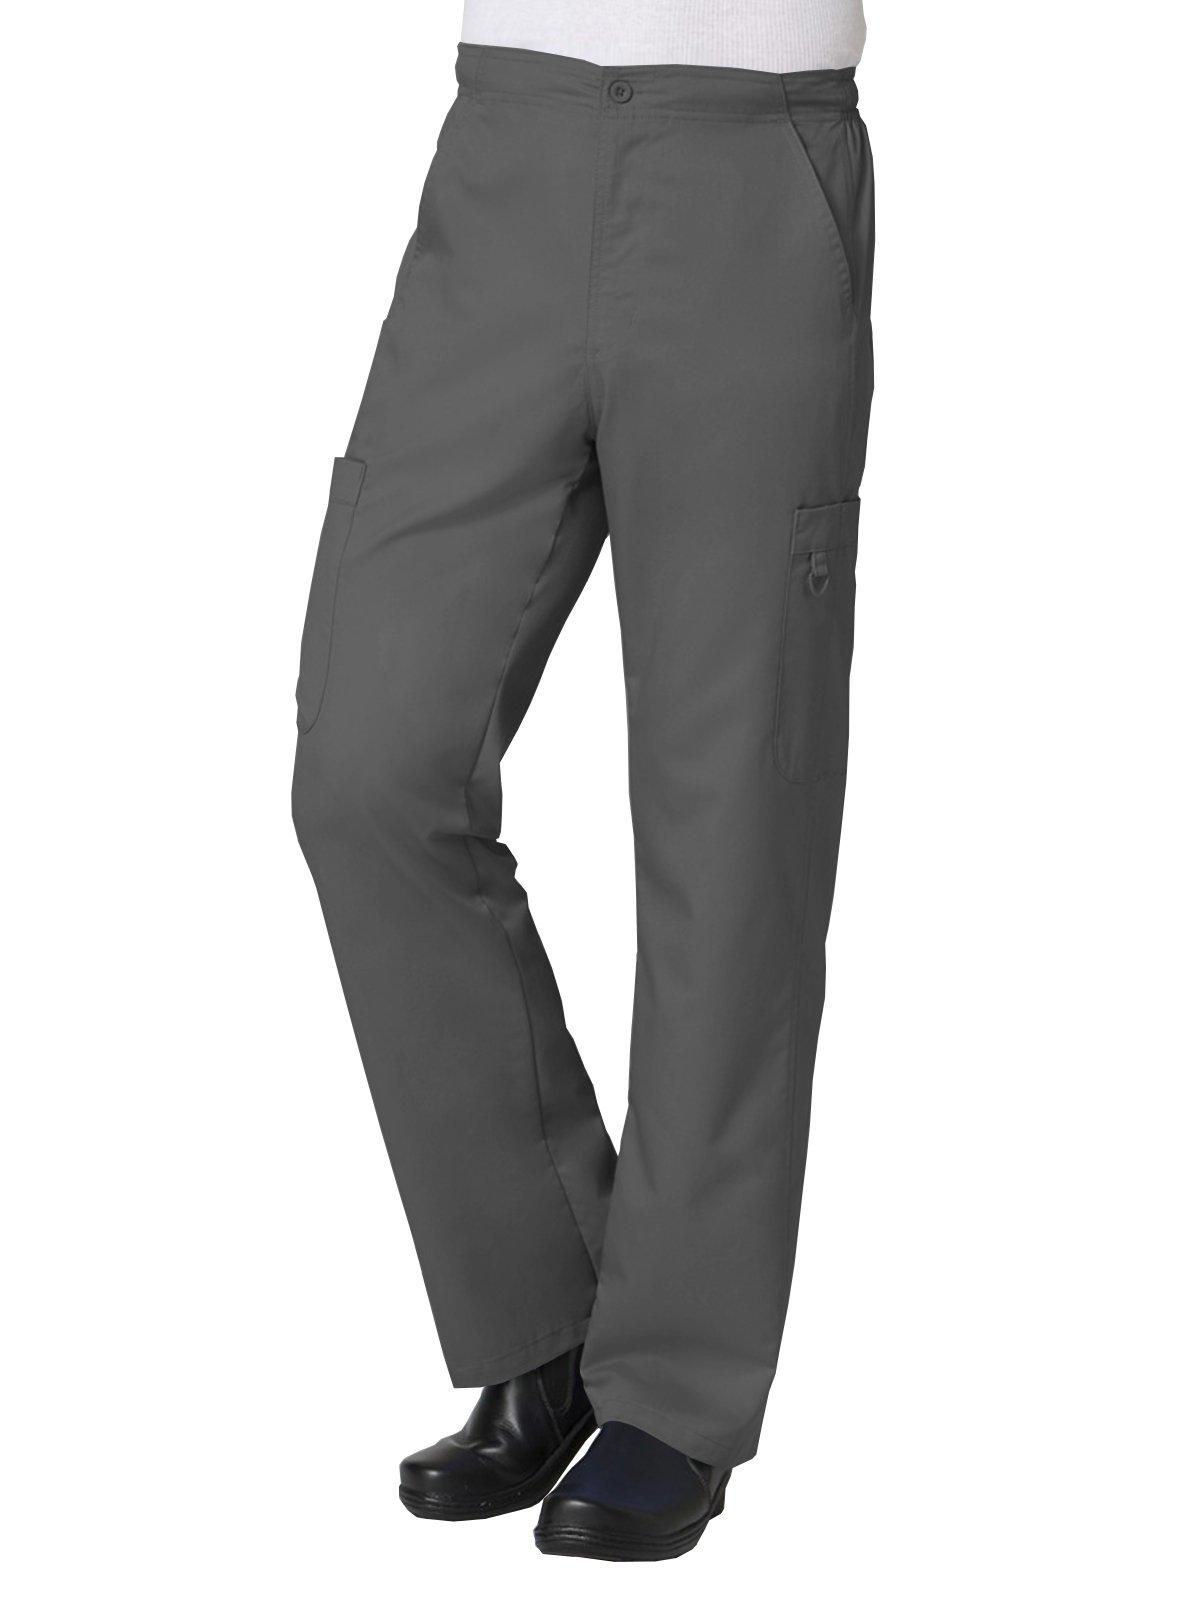 EON Men's Coolmax Half-Elastic Drawstring Waist Cargo Scrub Pant Medium Charcoal by Maevn